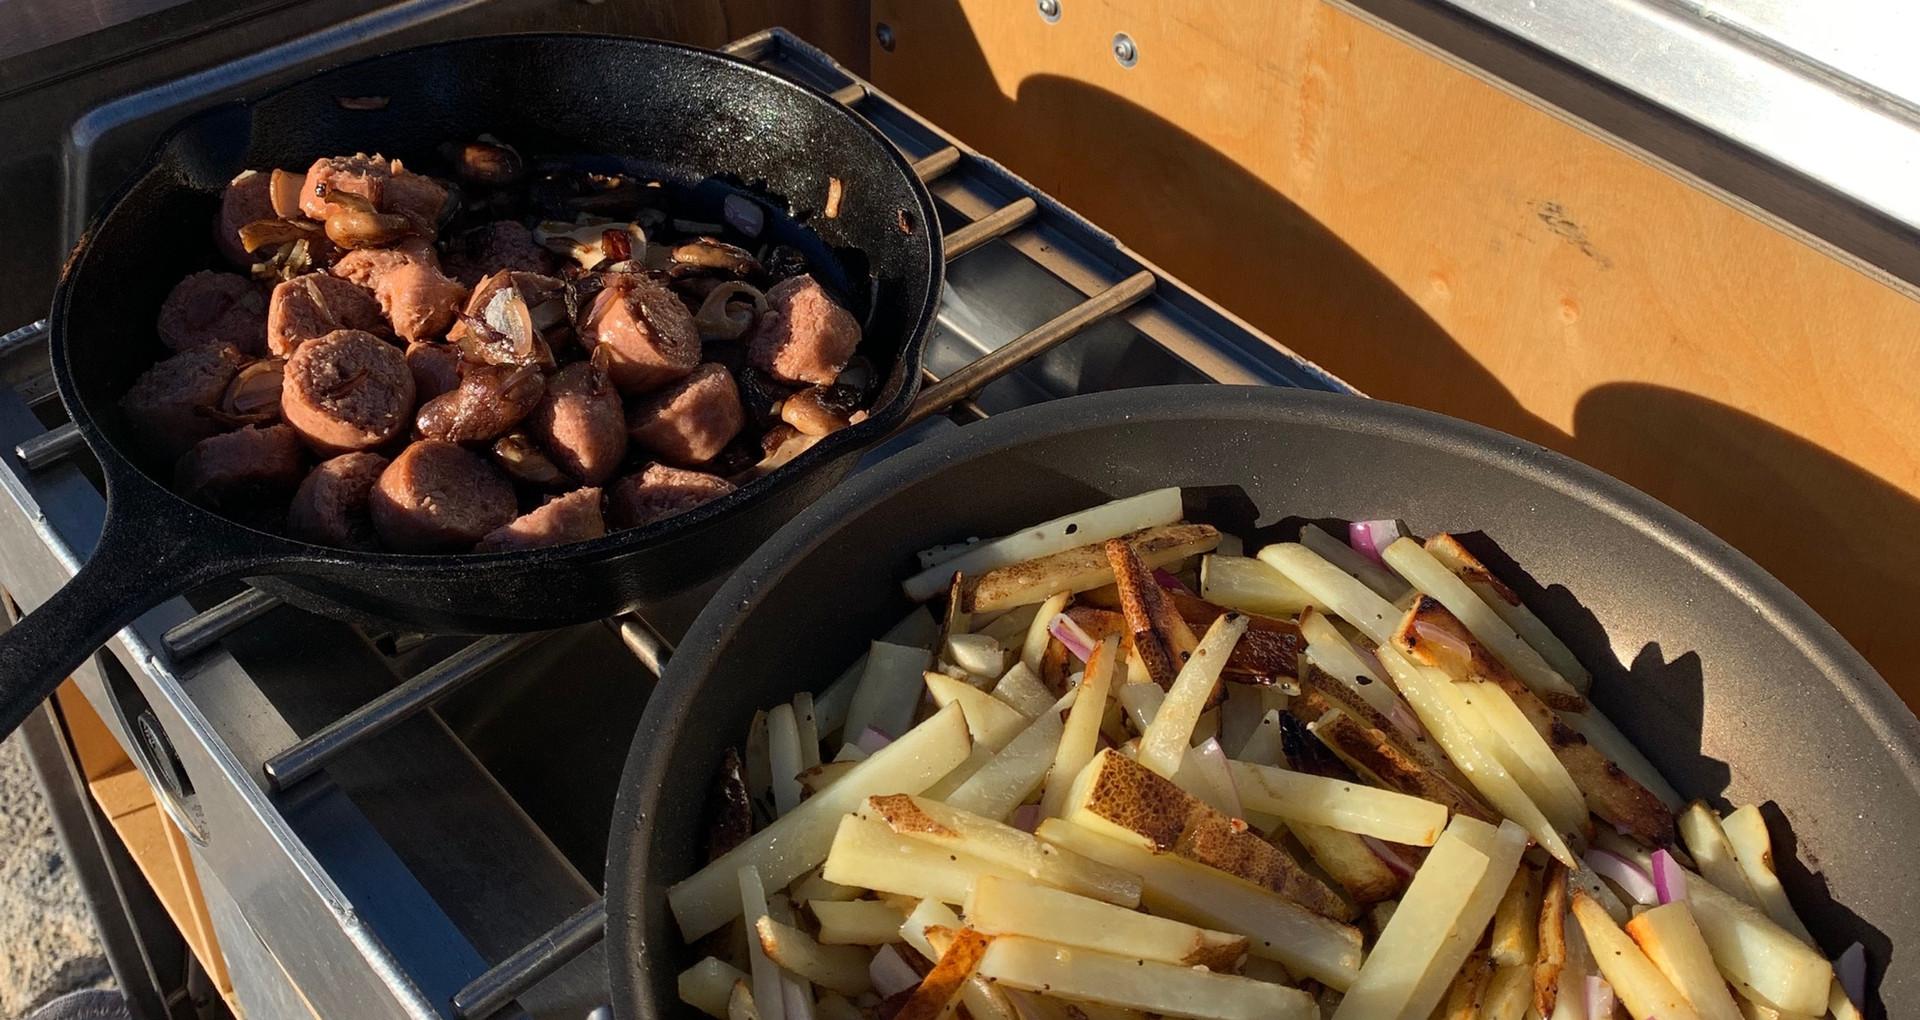 Camp cooking Kanz outdoors kitchen